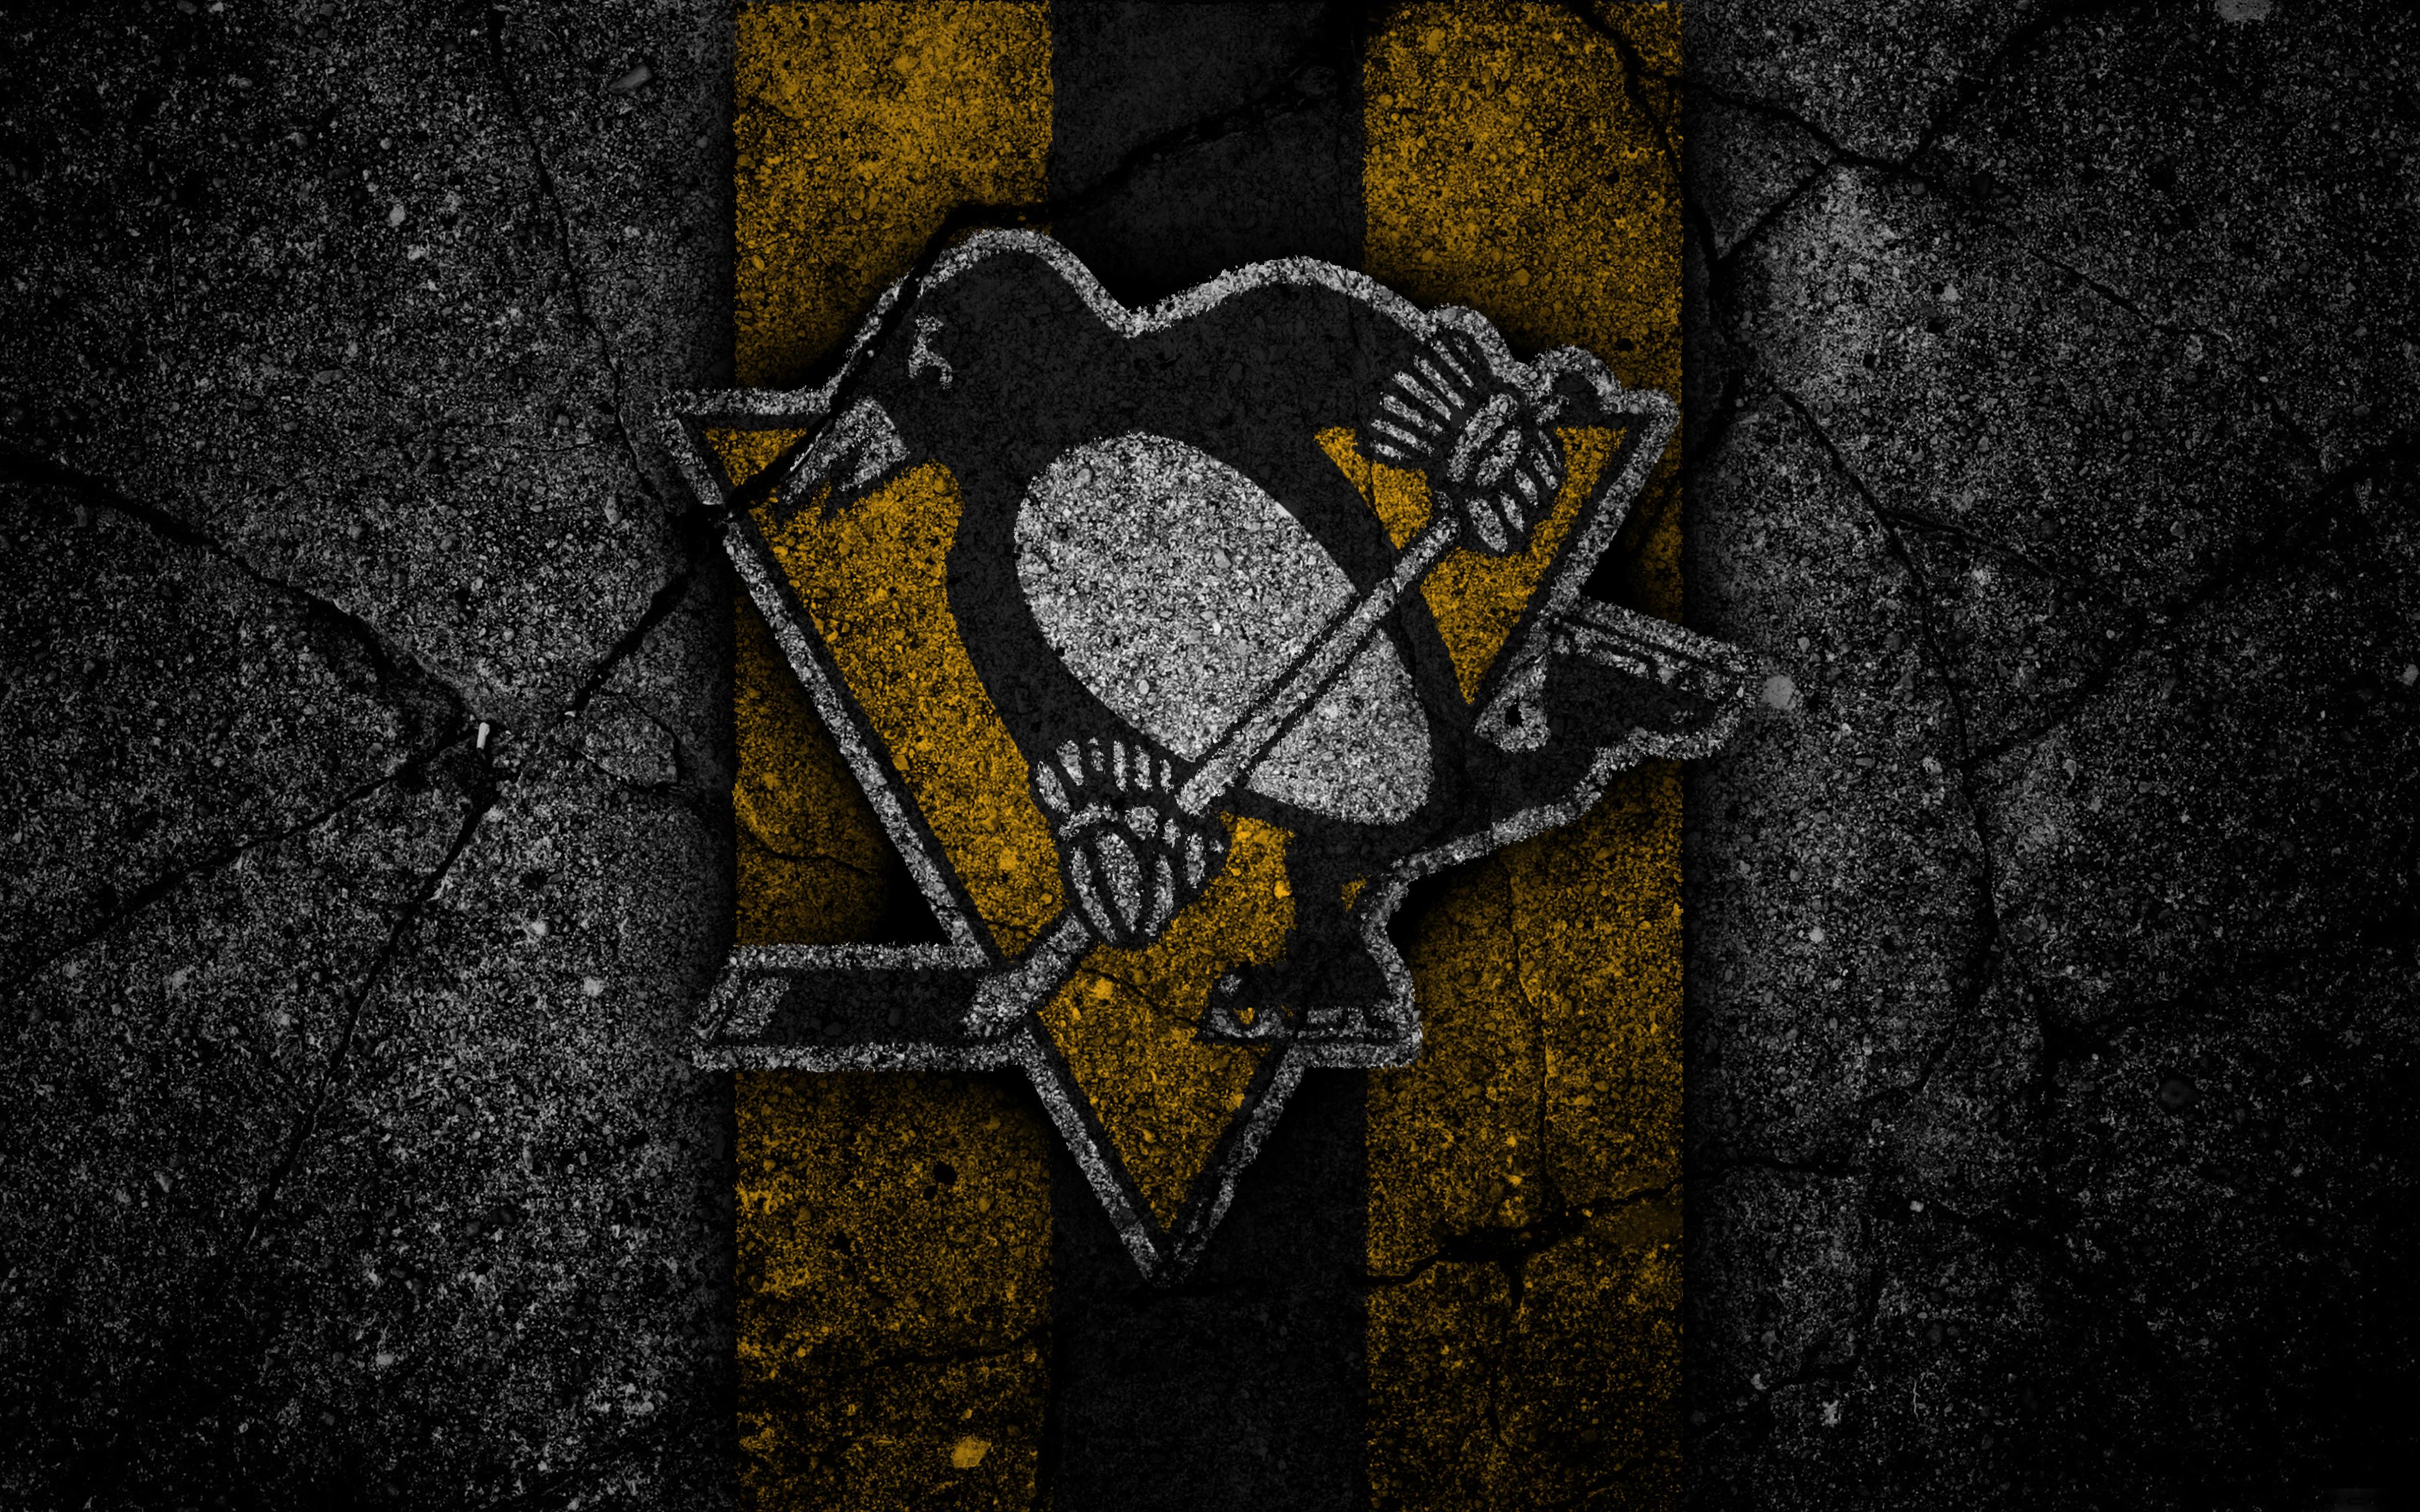 Pittsburgh Penguins 4k Ultra Fondo De Pantalla Hd Fondo De